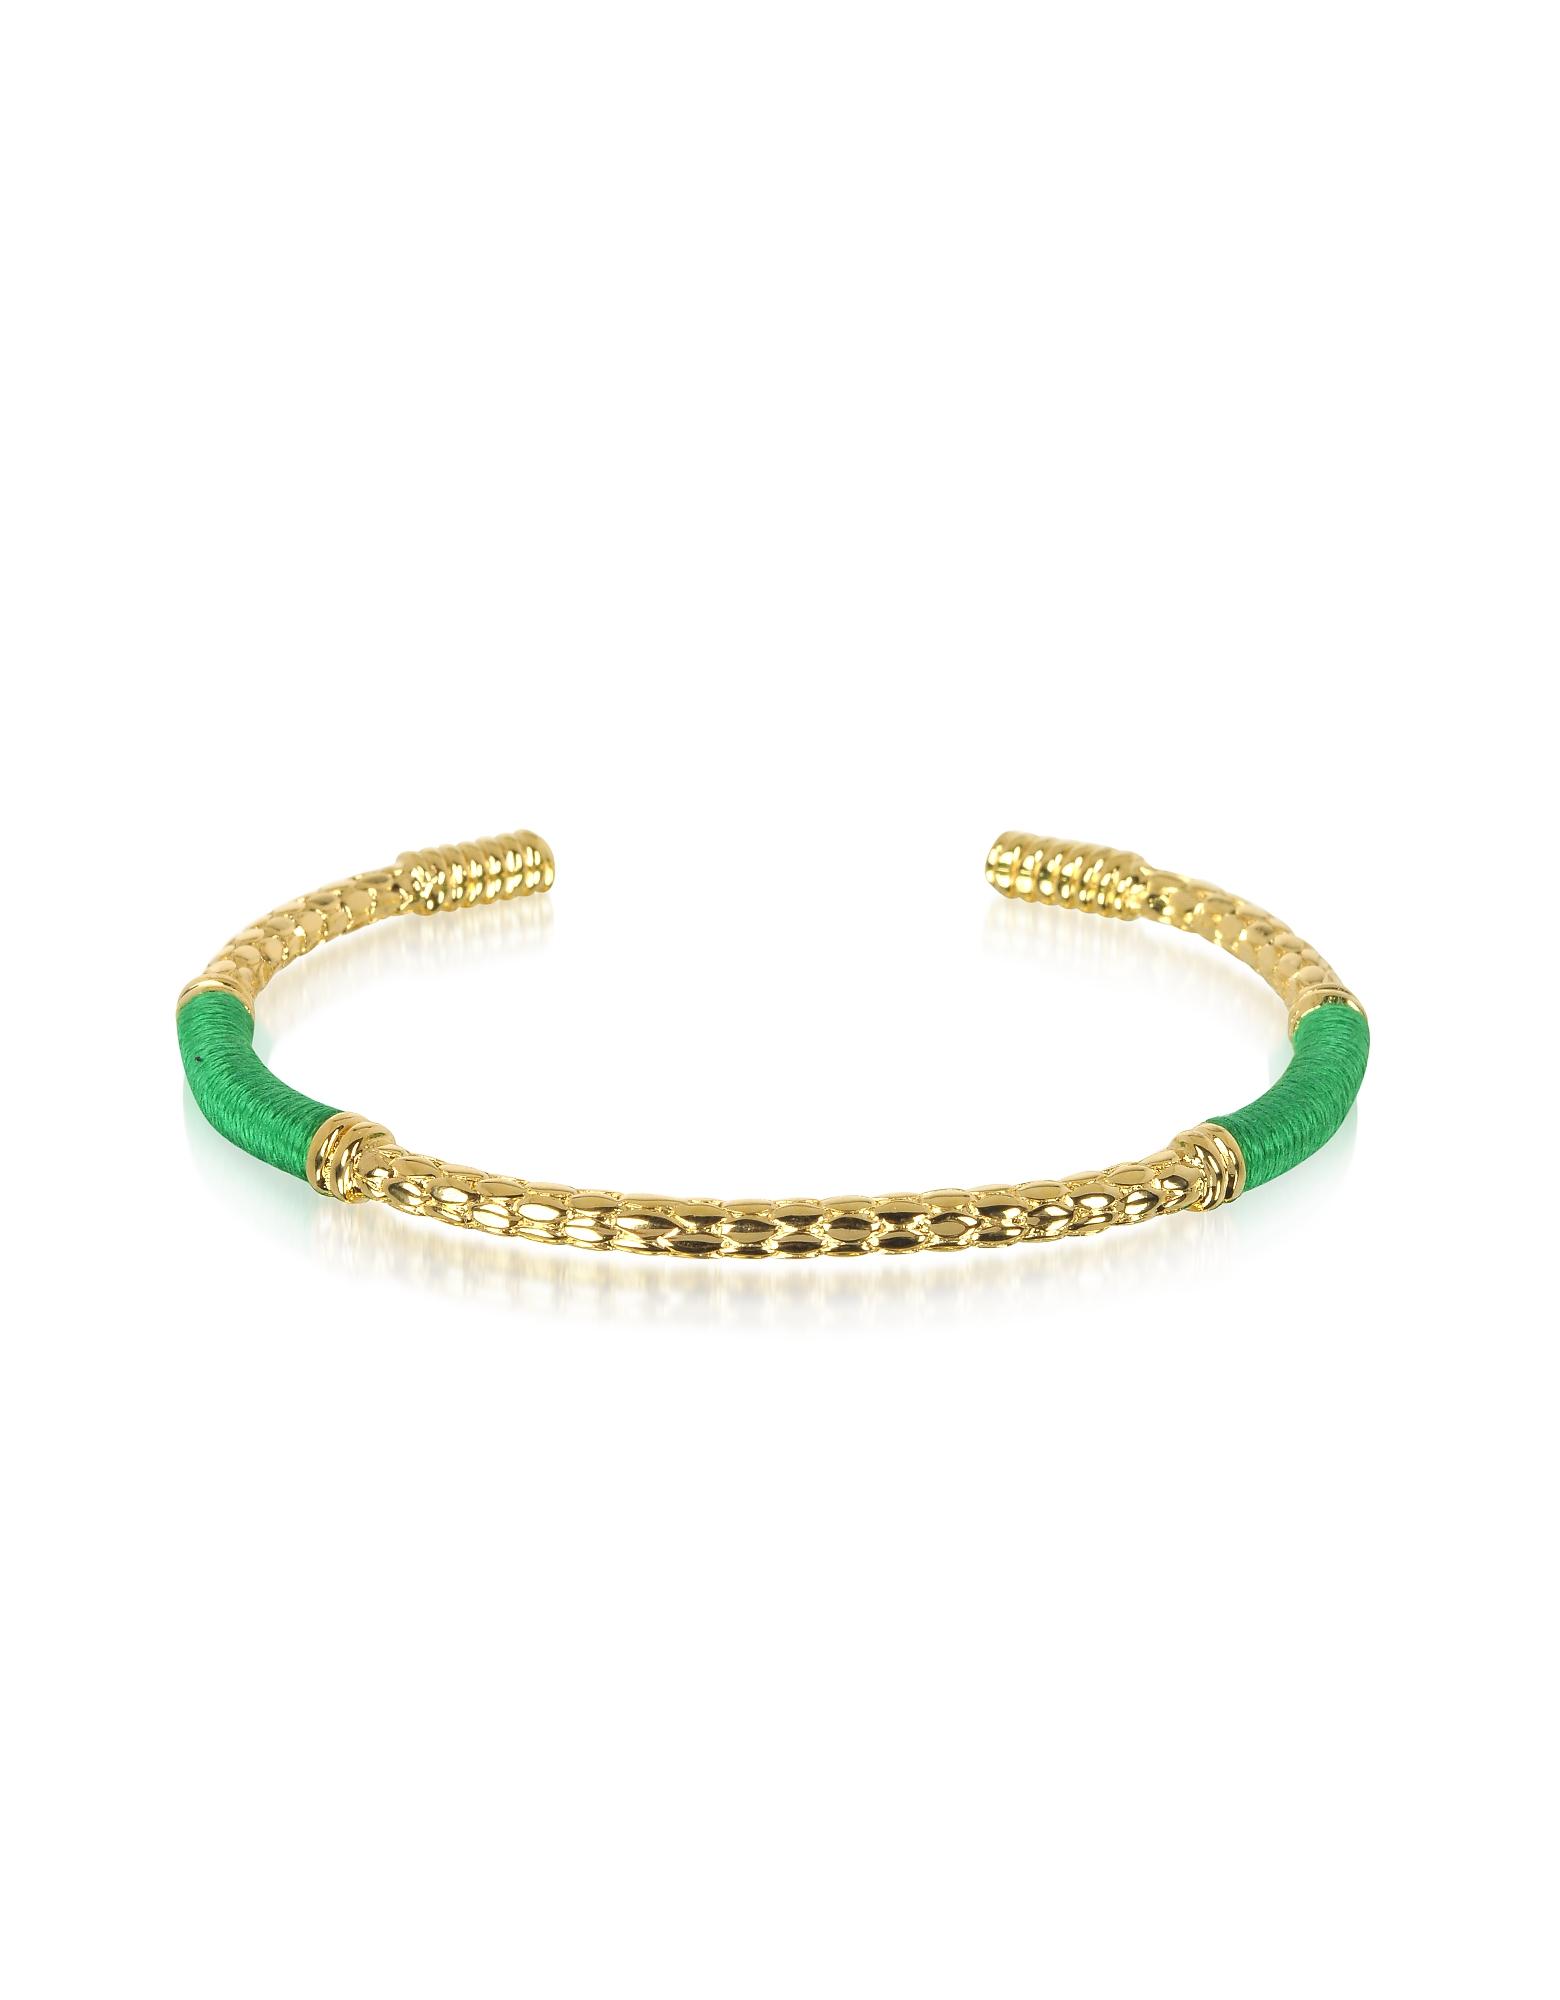 Aurelie Bidermann Bracelets, Soho Serpent 18K Gold-Plated Bangle w/Emerald Thread